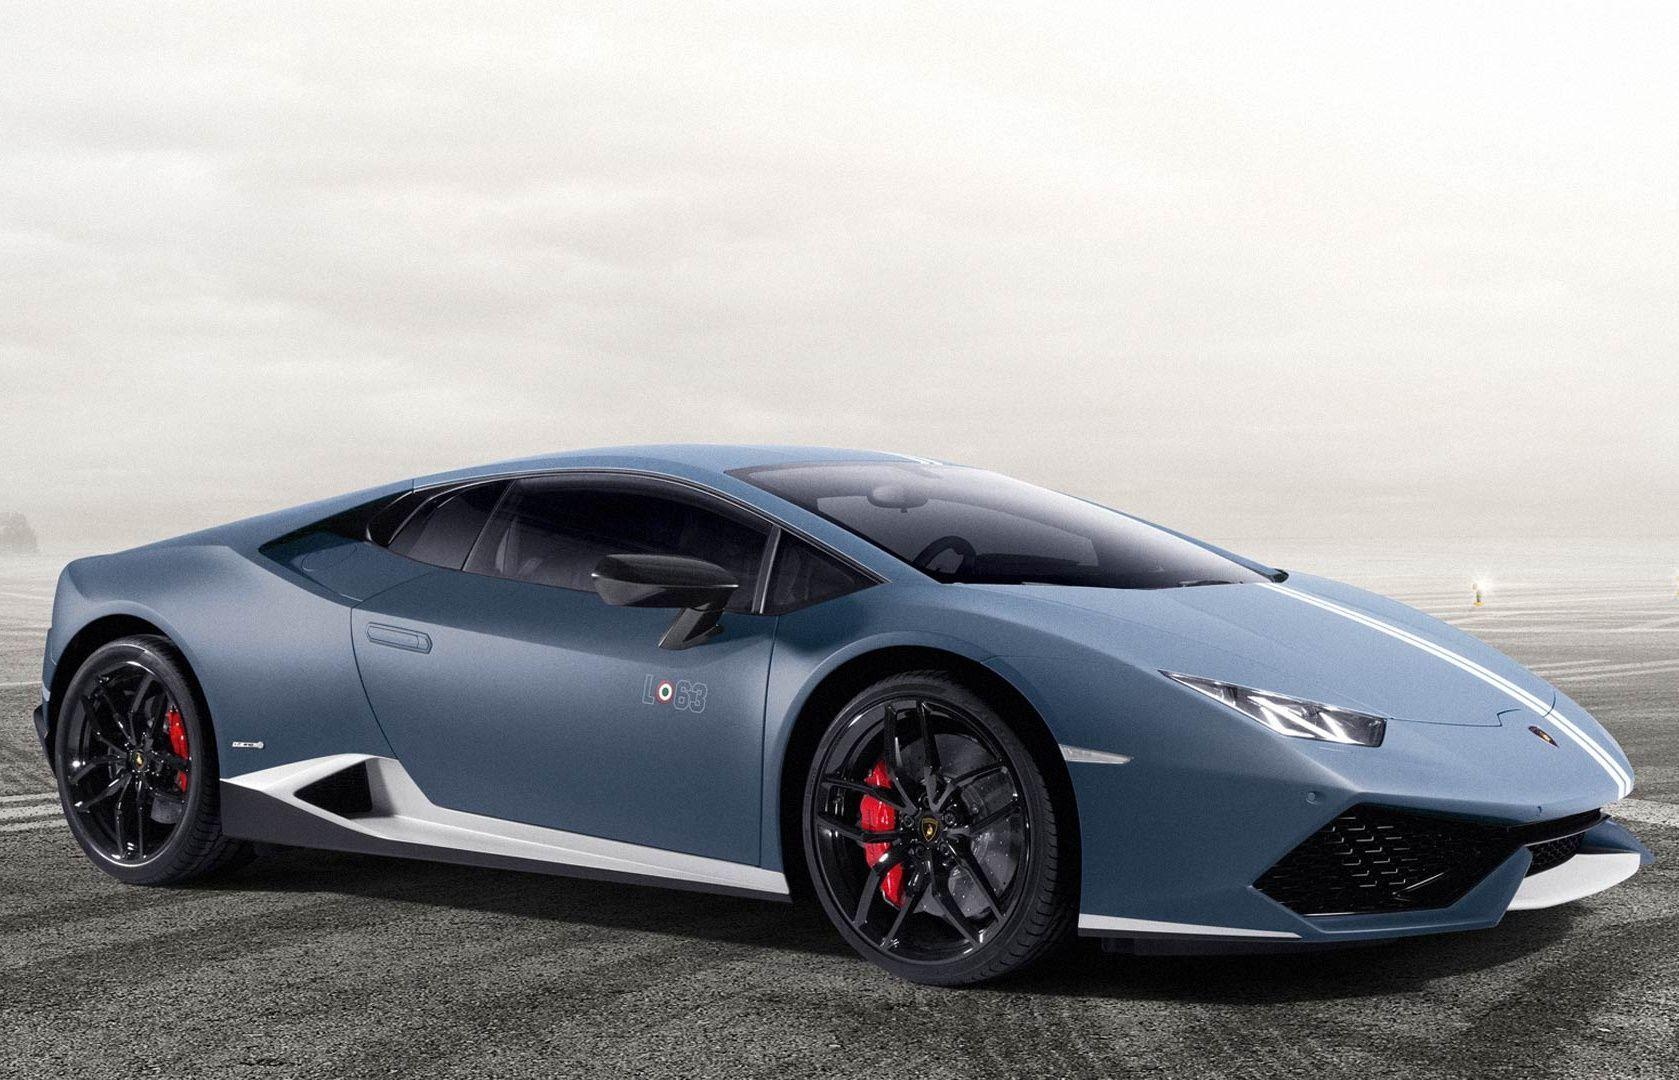 Lamborghini Launches Huracan Avio Special Edition In Indian Market